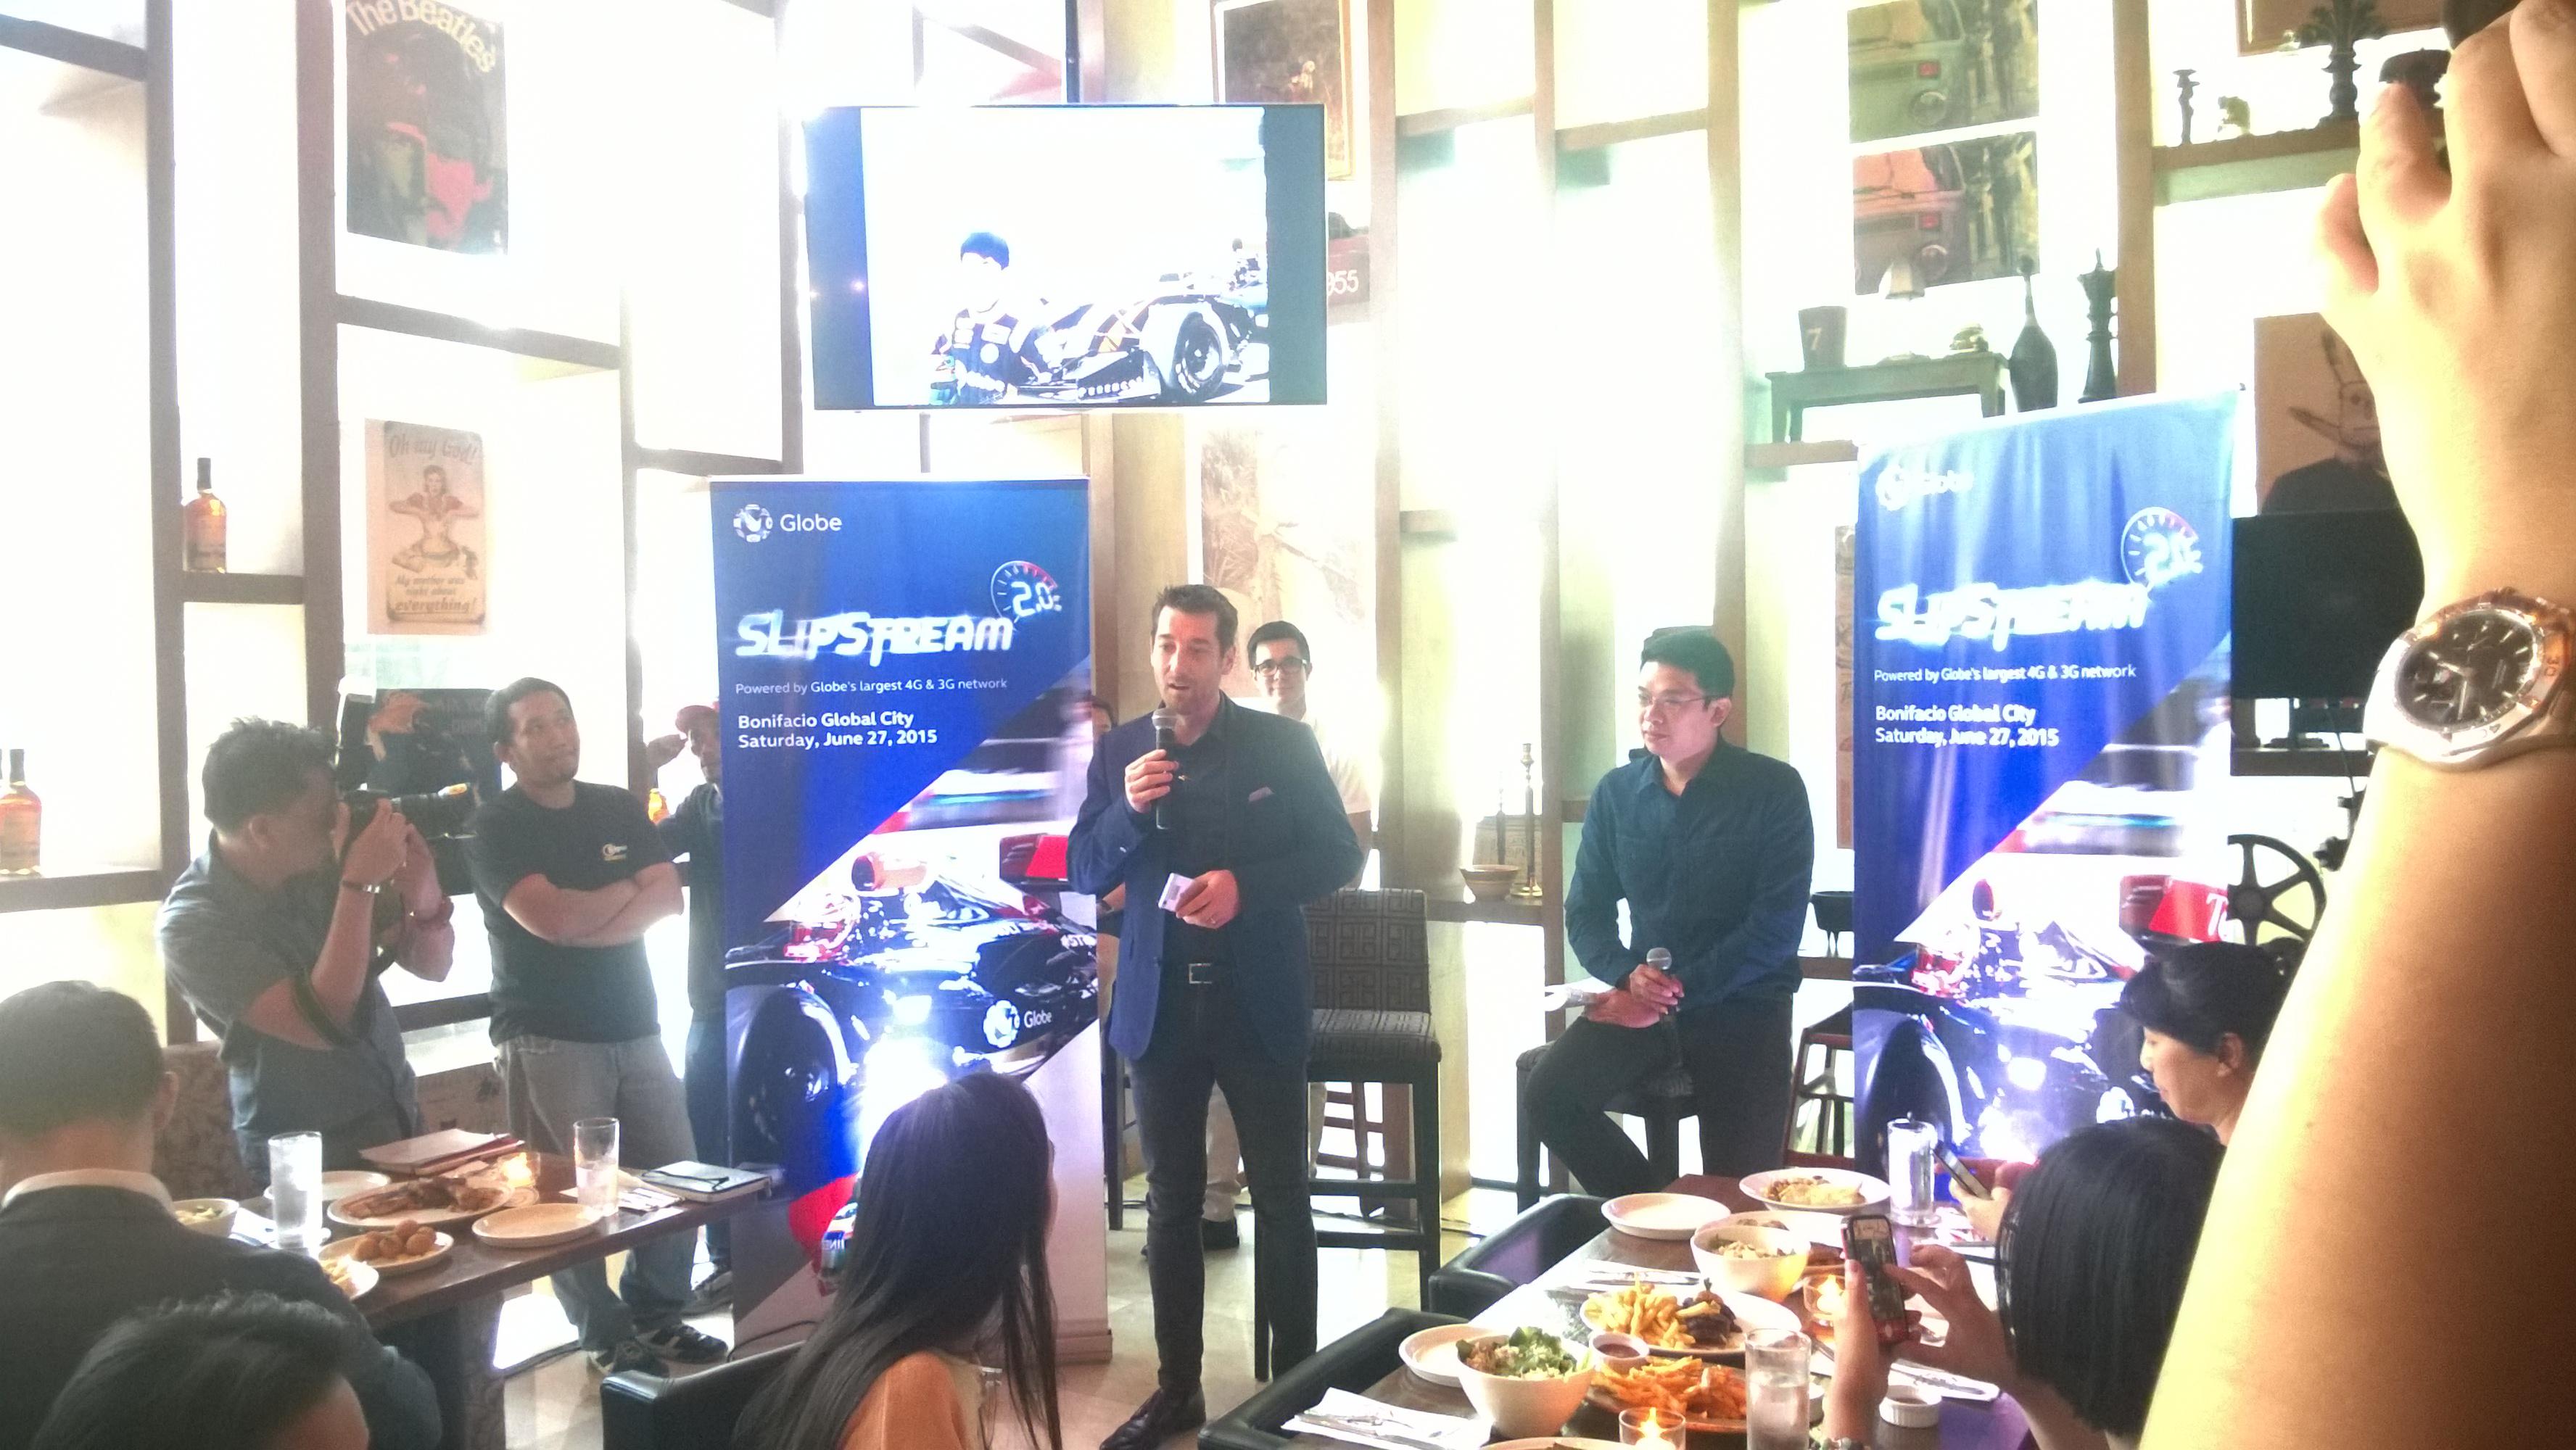 Globe Telecom Slip Stream Marlon Stockinger BGC Taguig Manila Philippines Duane Bacon Dan Horan Marketing Press